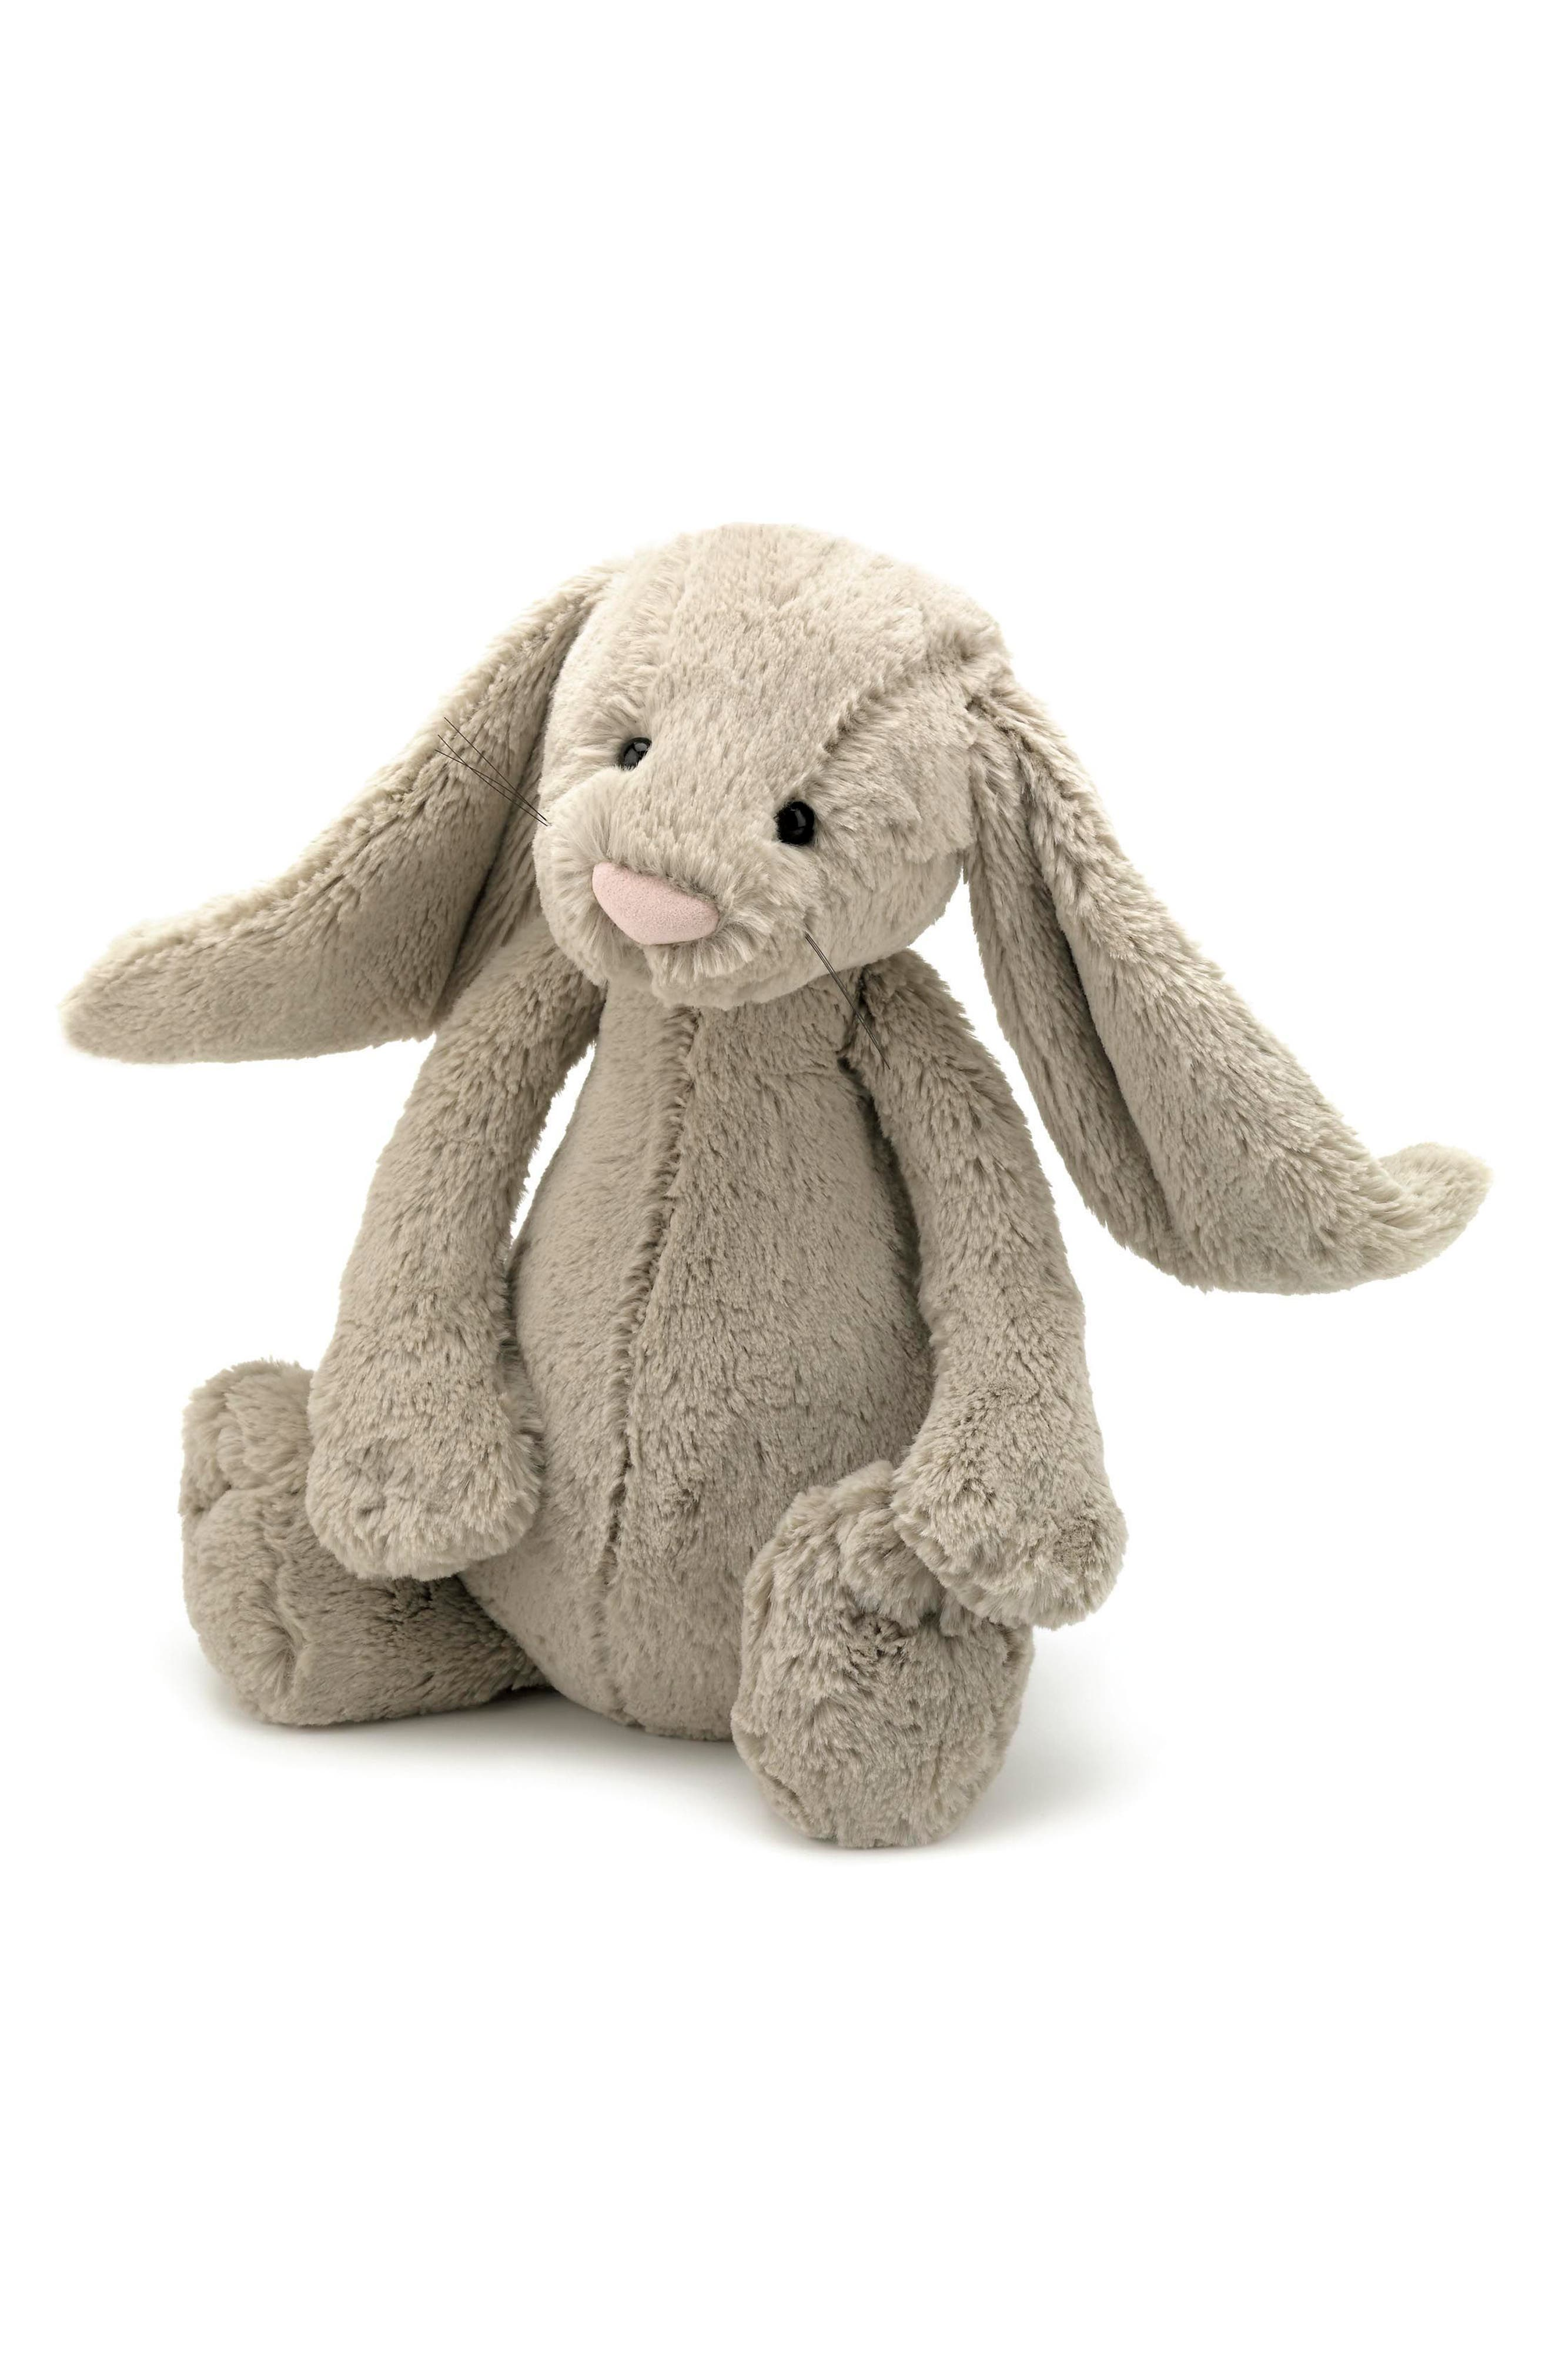 'Large Bashful Bunny' Stuffed Animal,                         Main,                         color, Beige